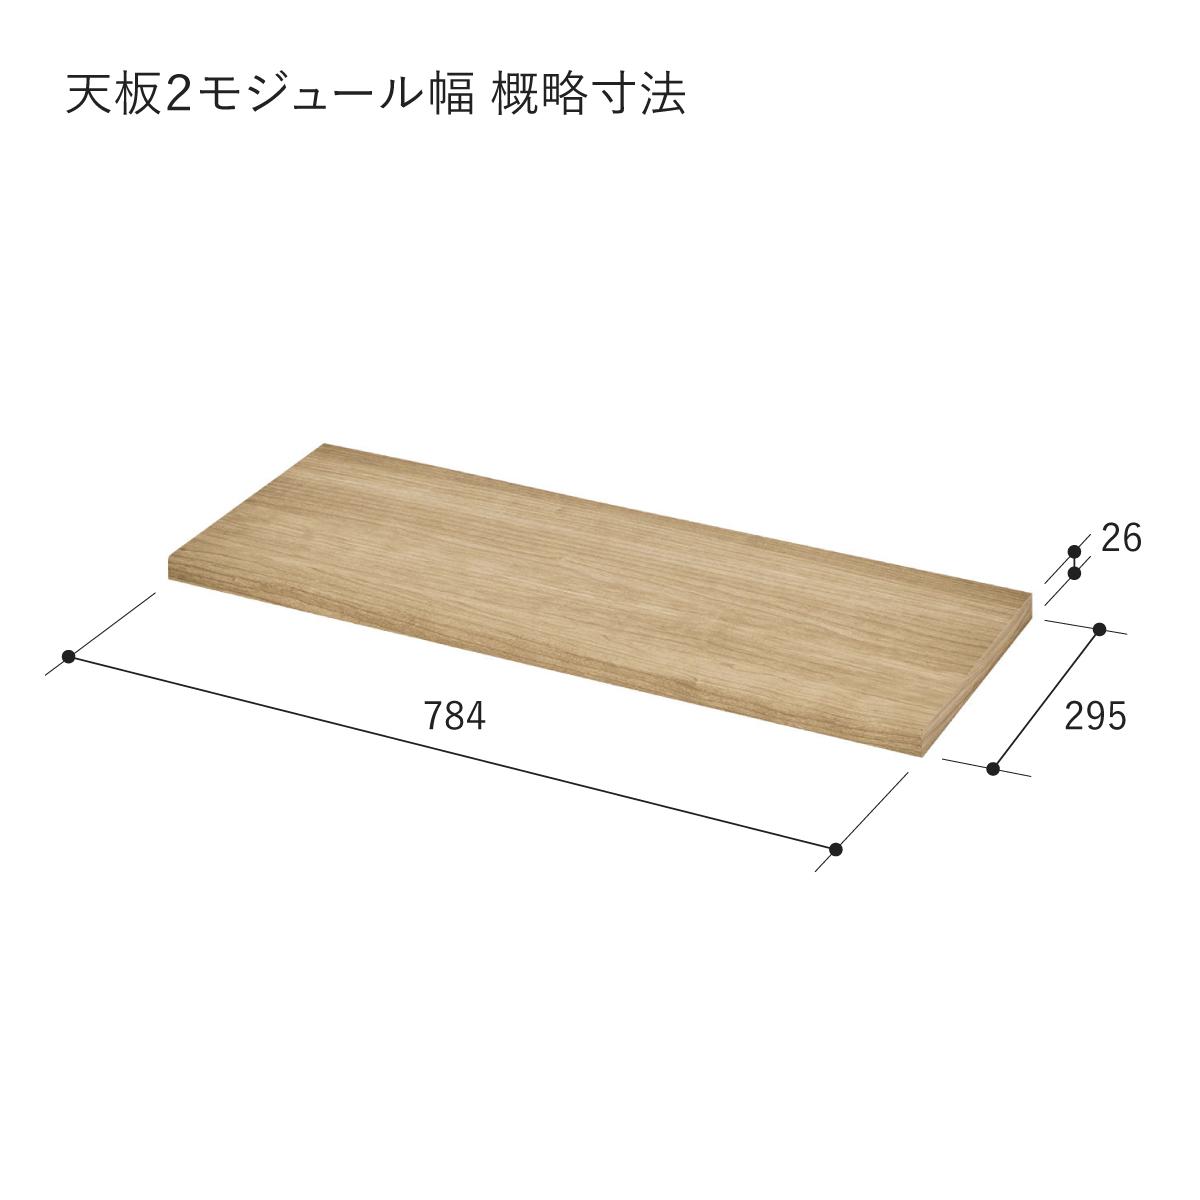 【V-TISS LIGHT】 天板 2モジュール幅(背面溝なし)